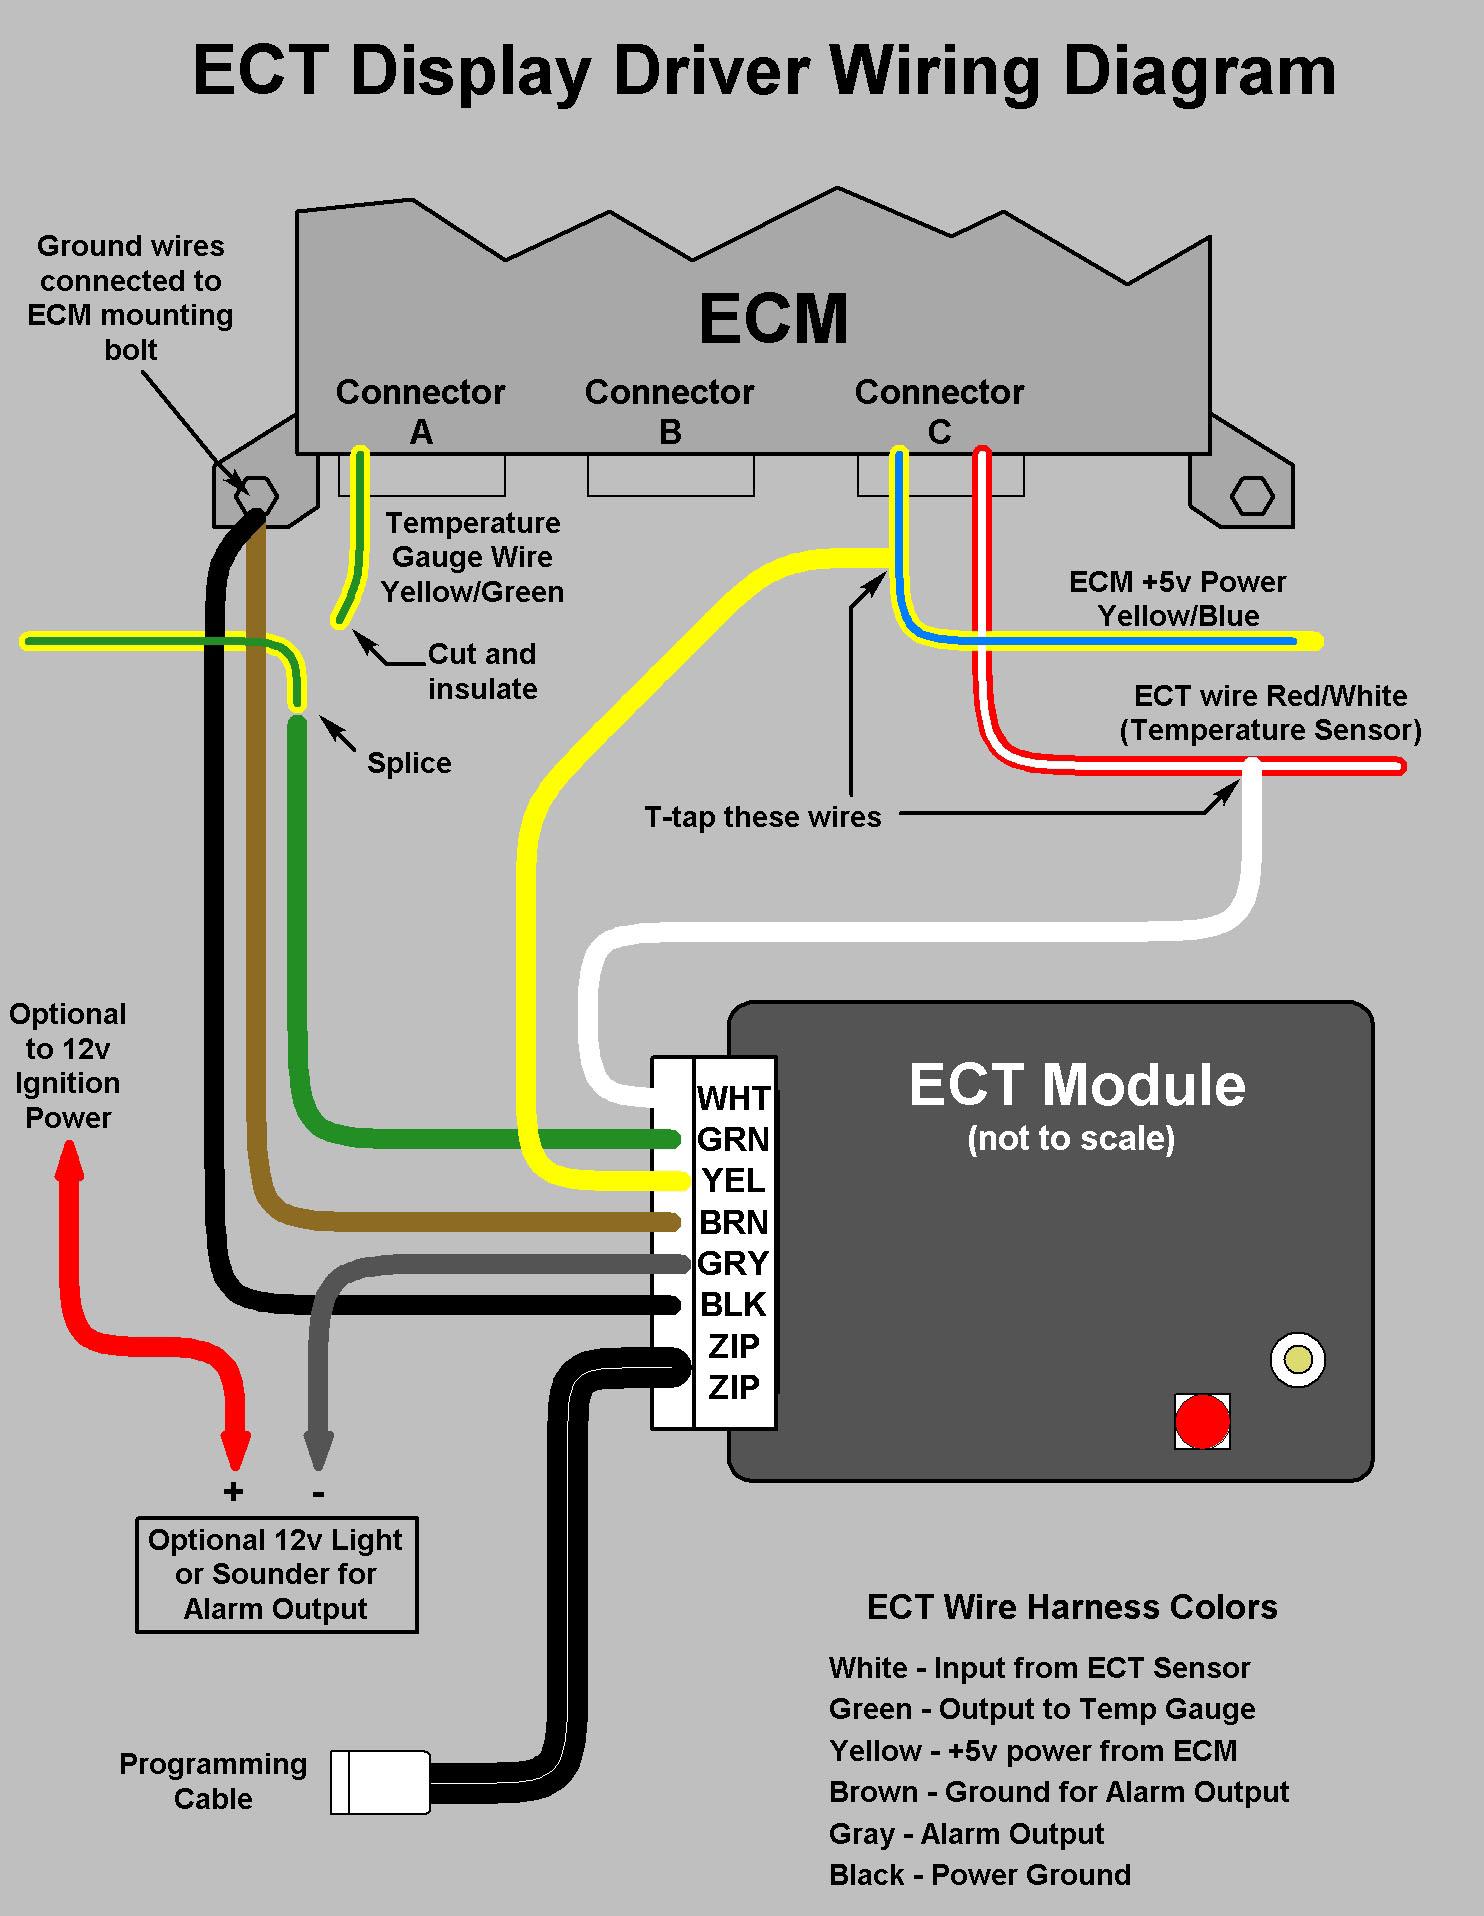 cushman truckster wiring diagram all wiring diagram Cushman Turf Truckster Wiring-Diagram cushman hawk wiring diagram wiring diagram cushman 735 parts cushman truckster wiring diagram